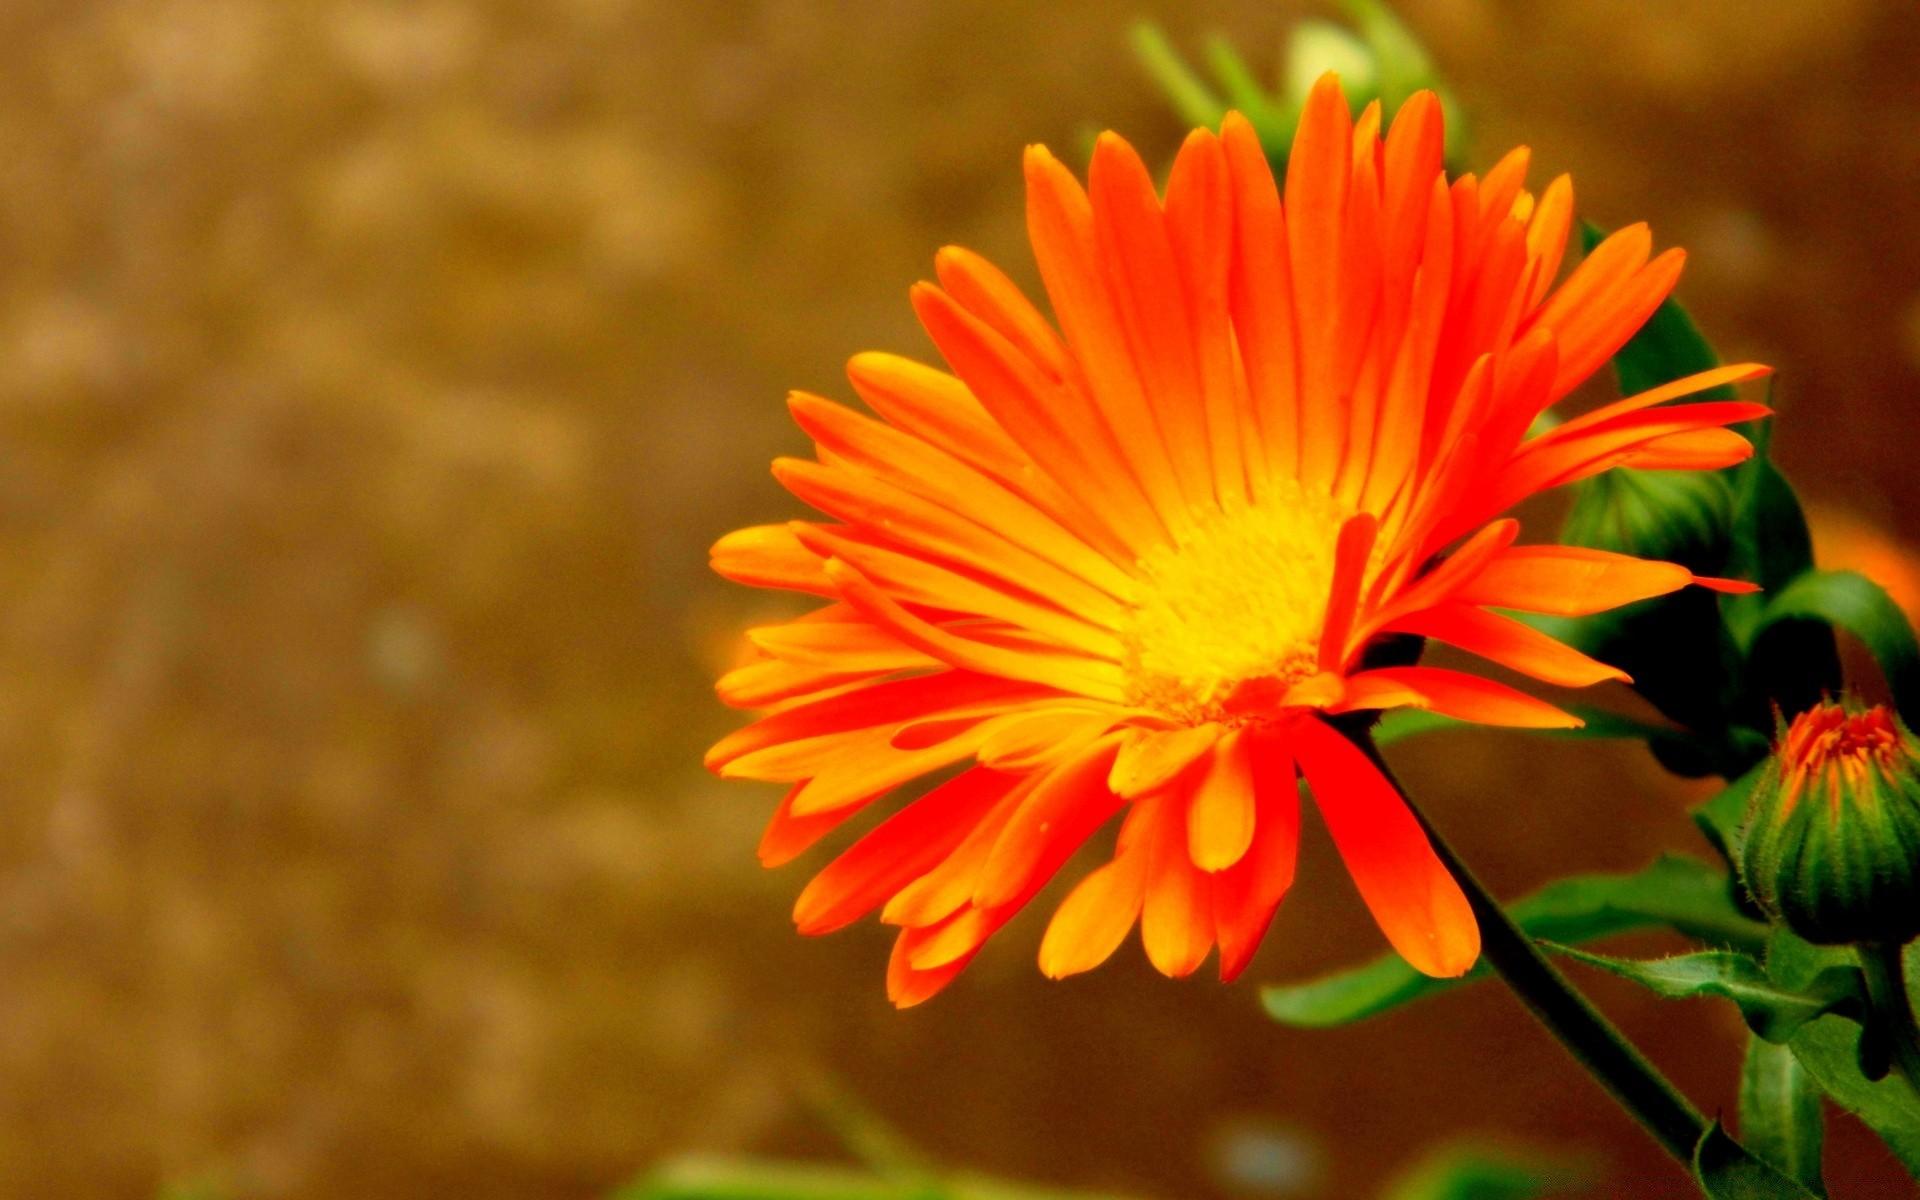 Открытки, картинки оранжевых